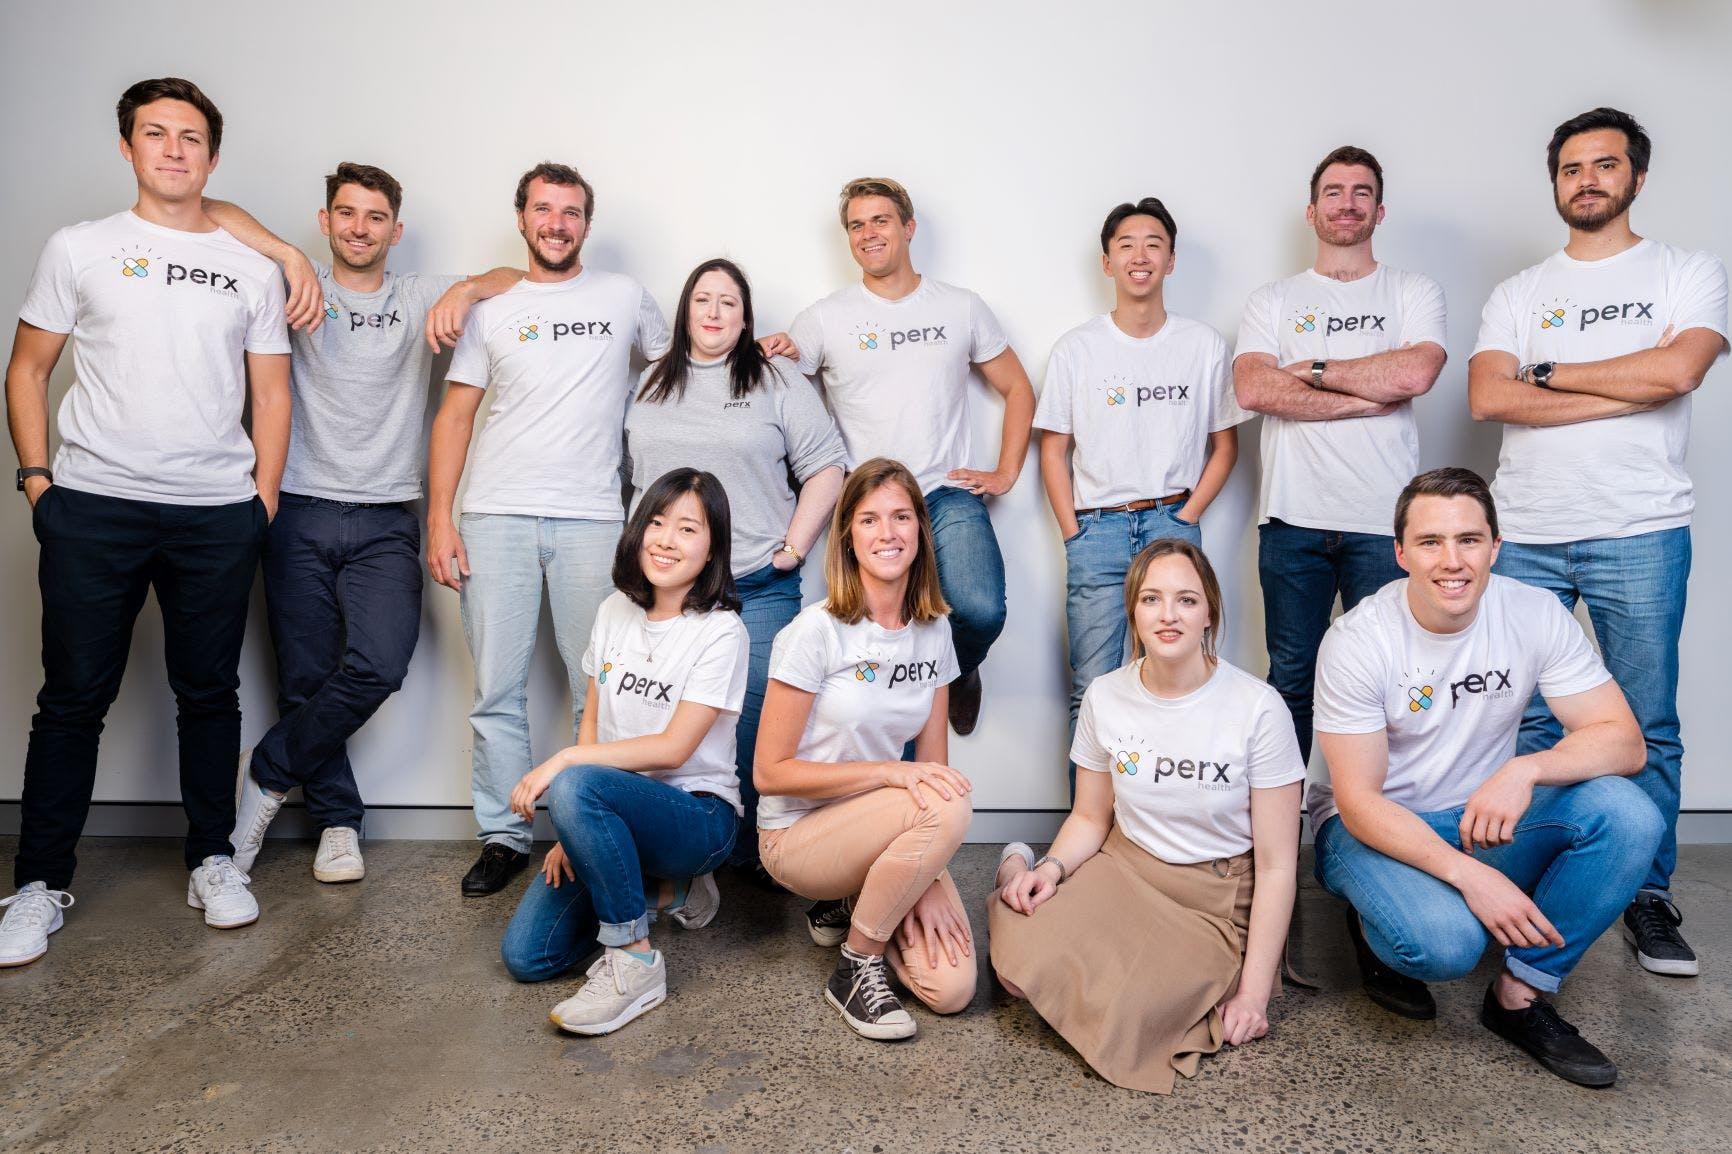 Our team photo